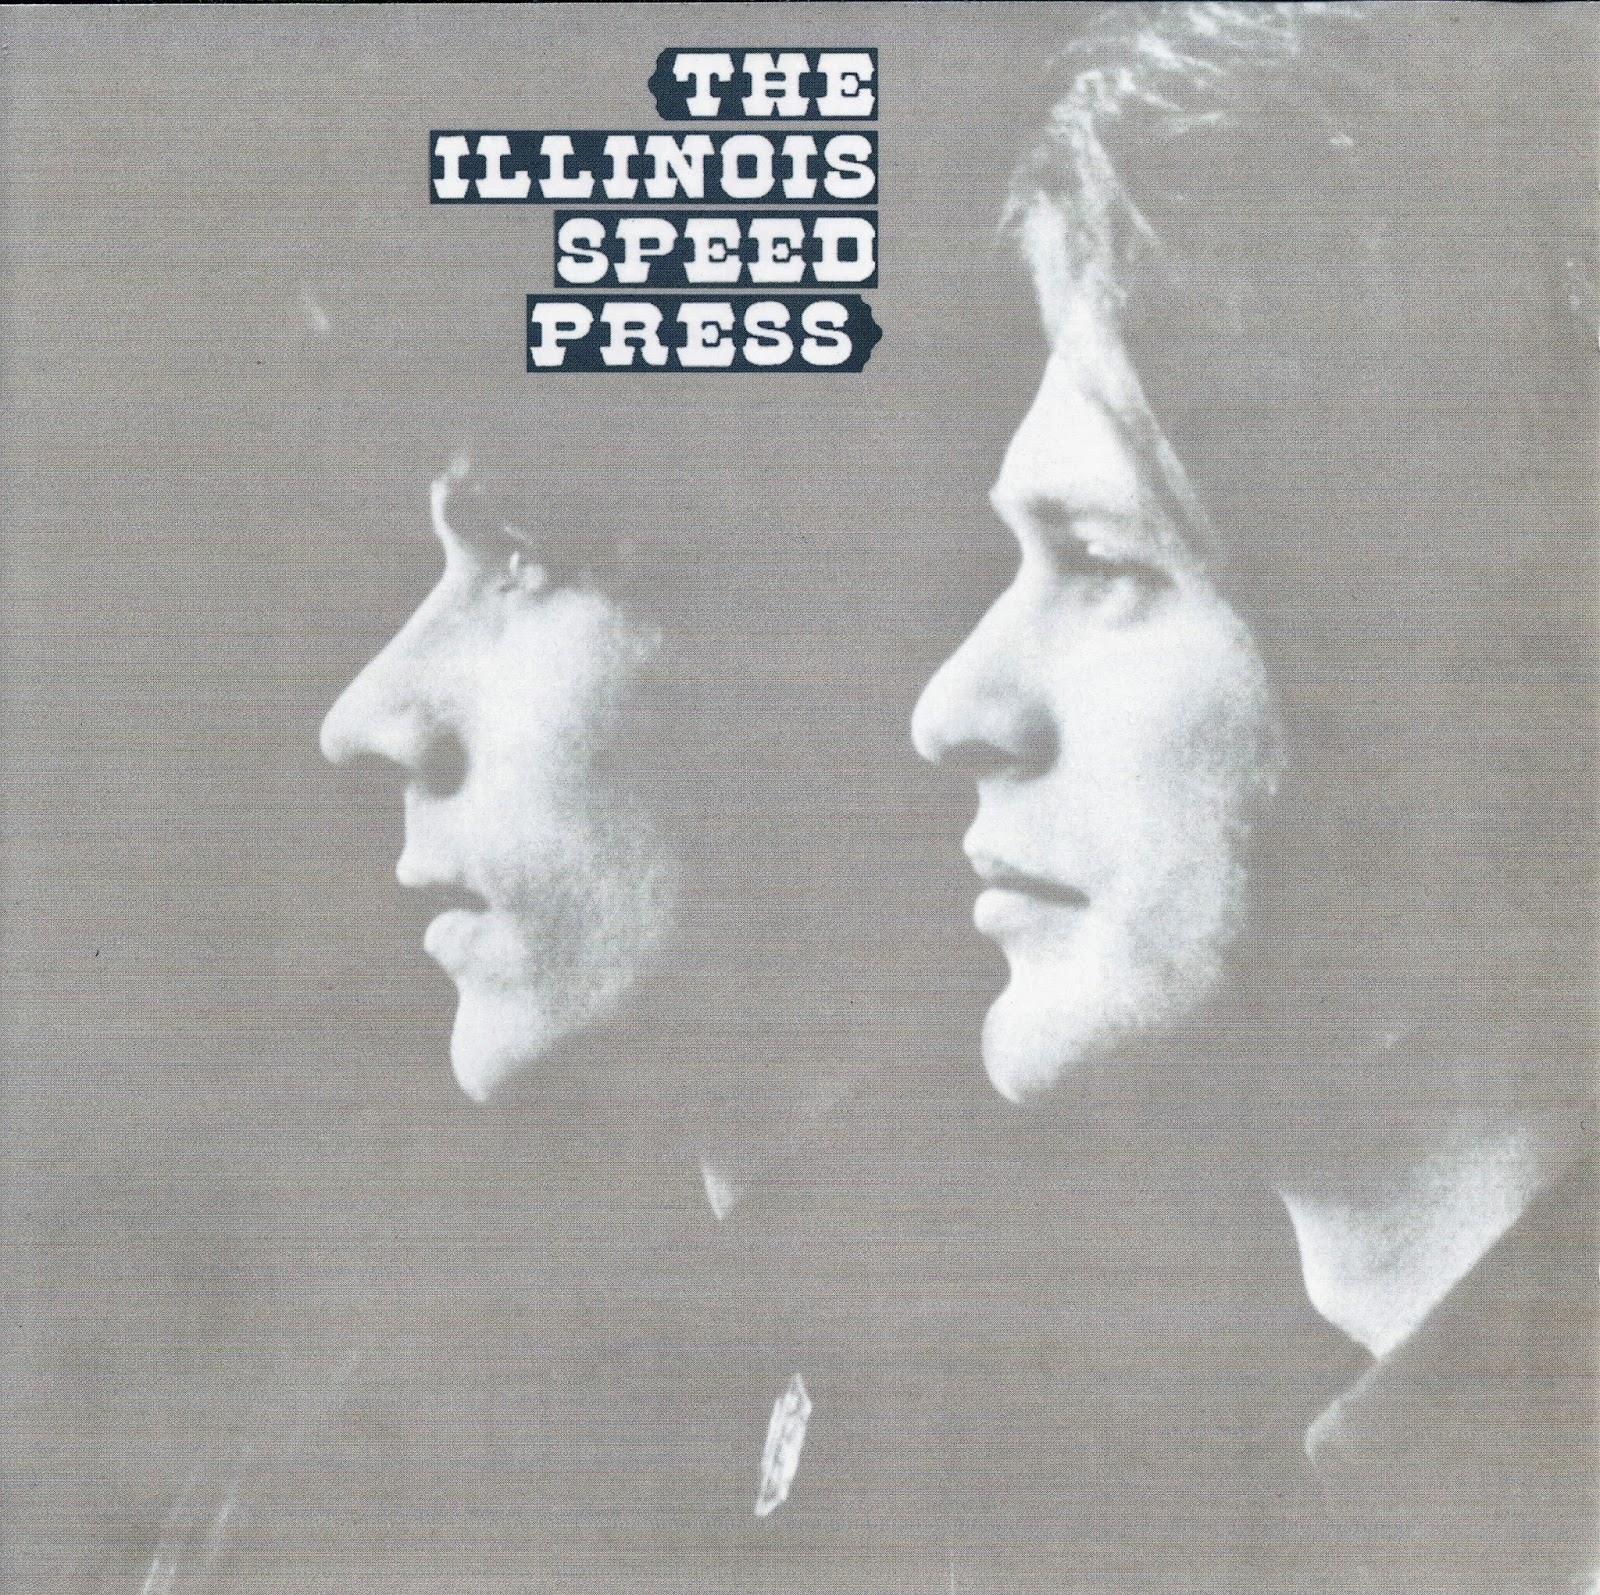 The Illinois Speed Press - The Illinois Speed Press (1969 us